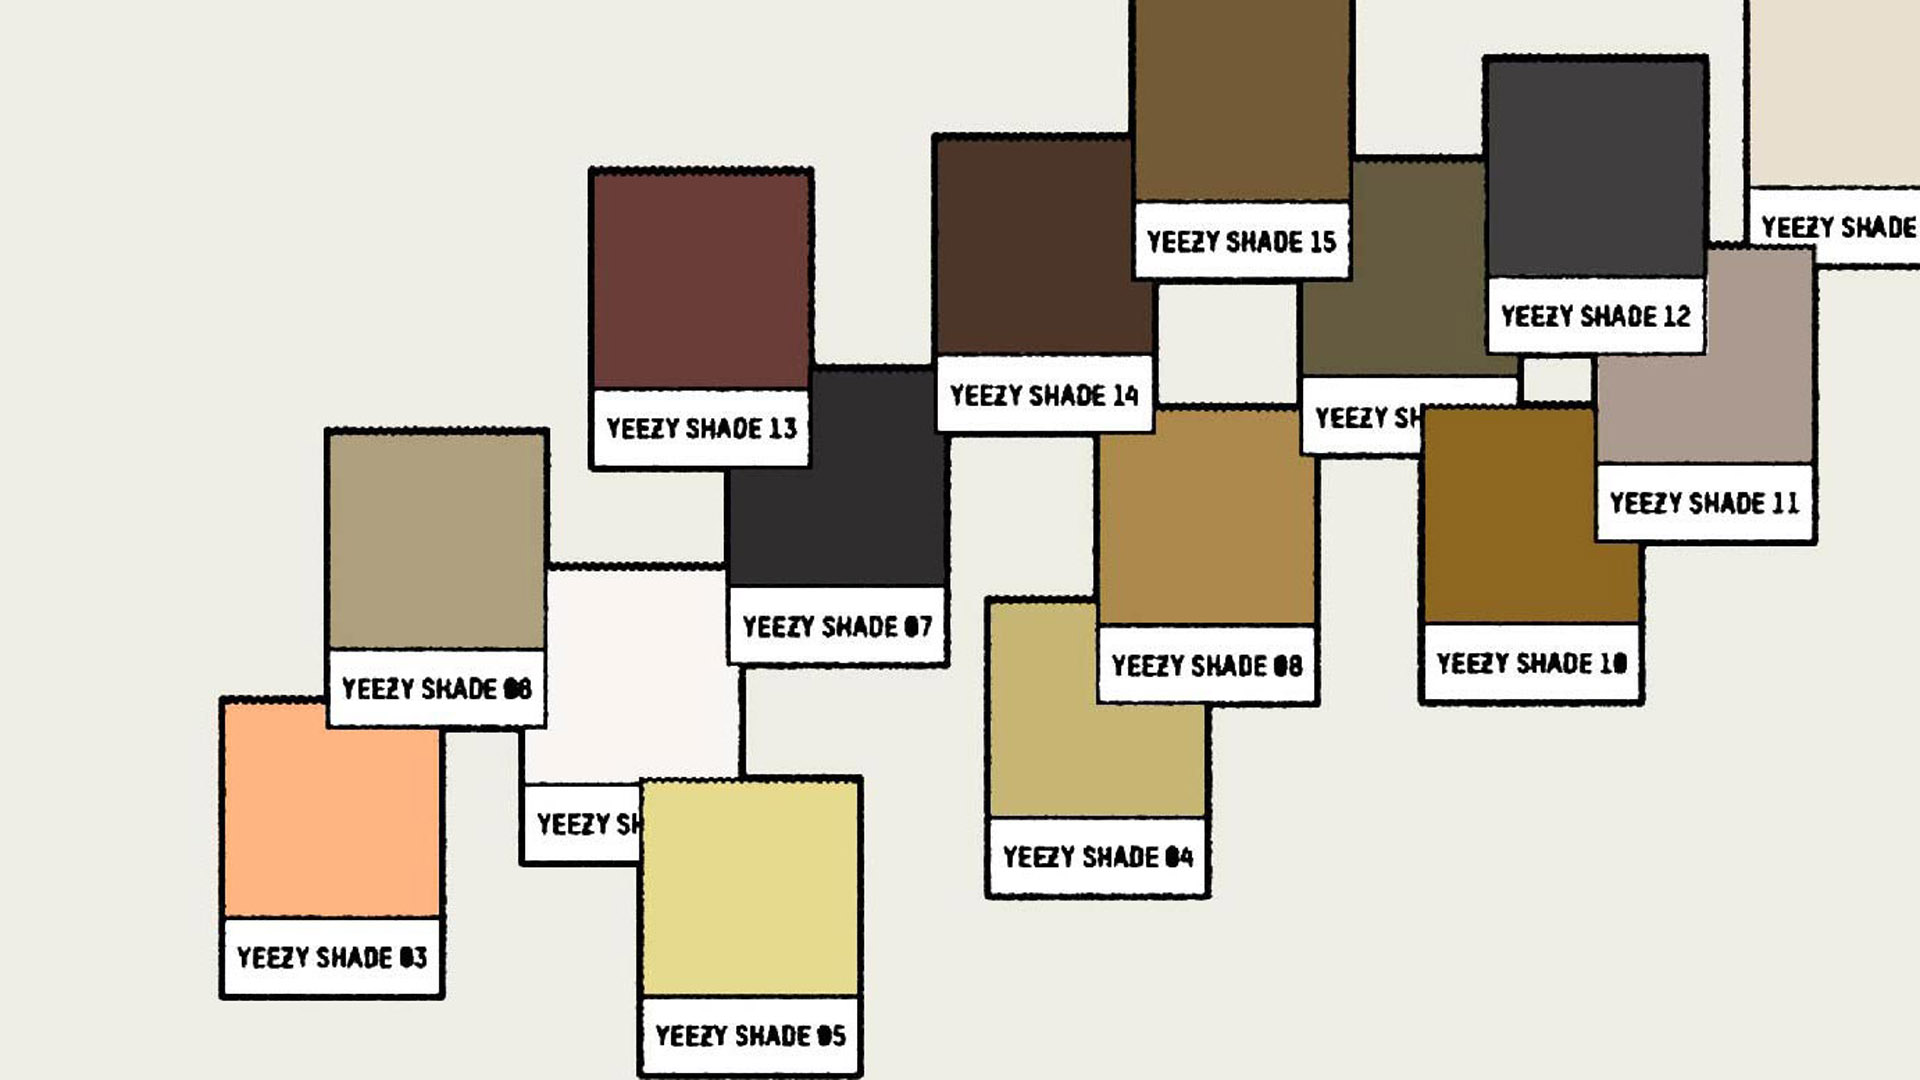 yeezy boost 350 v2 adidas best tigt 14 neue farben f r. Black Bedroom Furniture Sets. Home Design Ideas